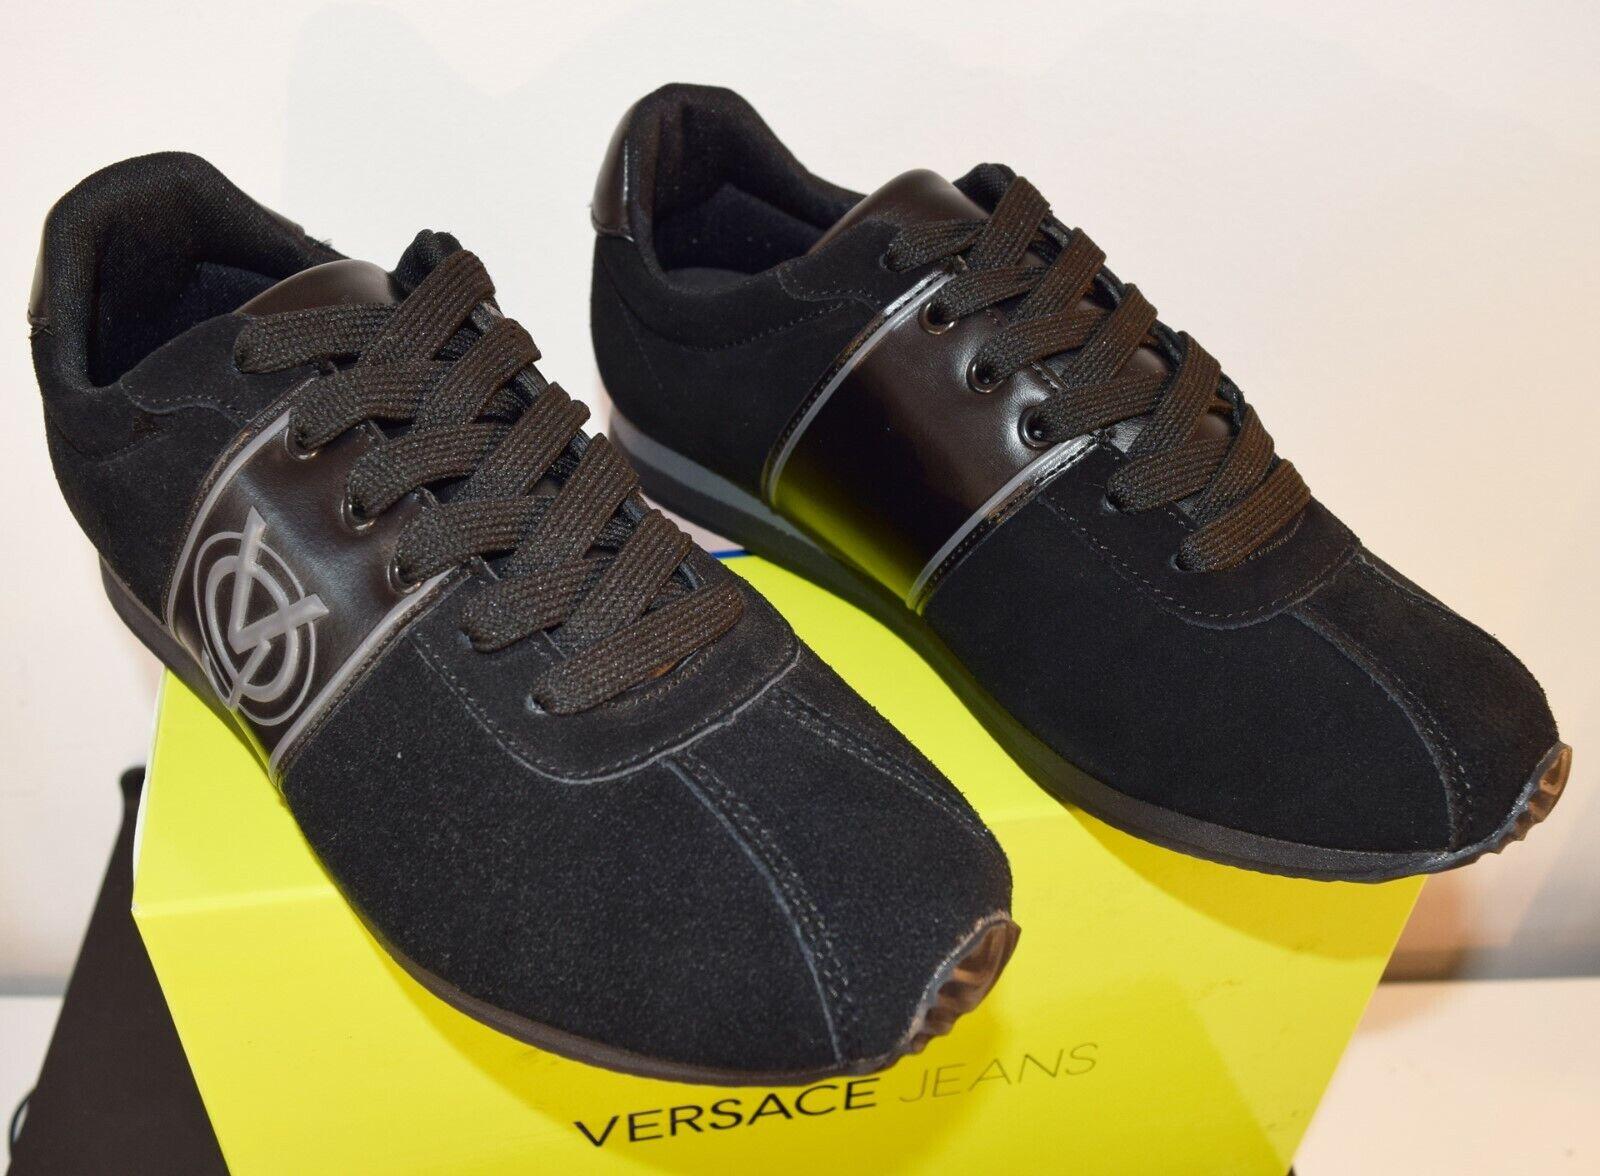 zapatos VERSACE JEANS zapatillas LINEA RUNNING mujer Talla 40 negro MOD.E0GQBSB1